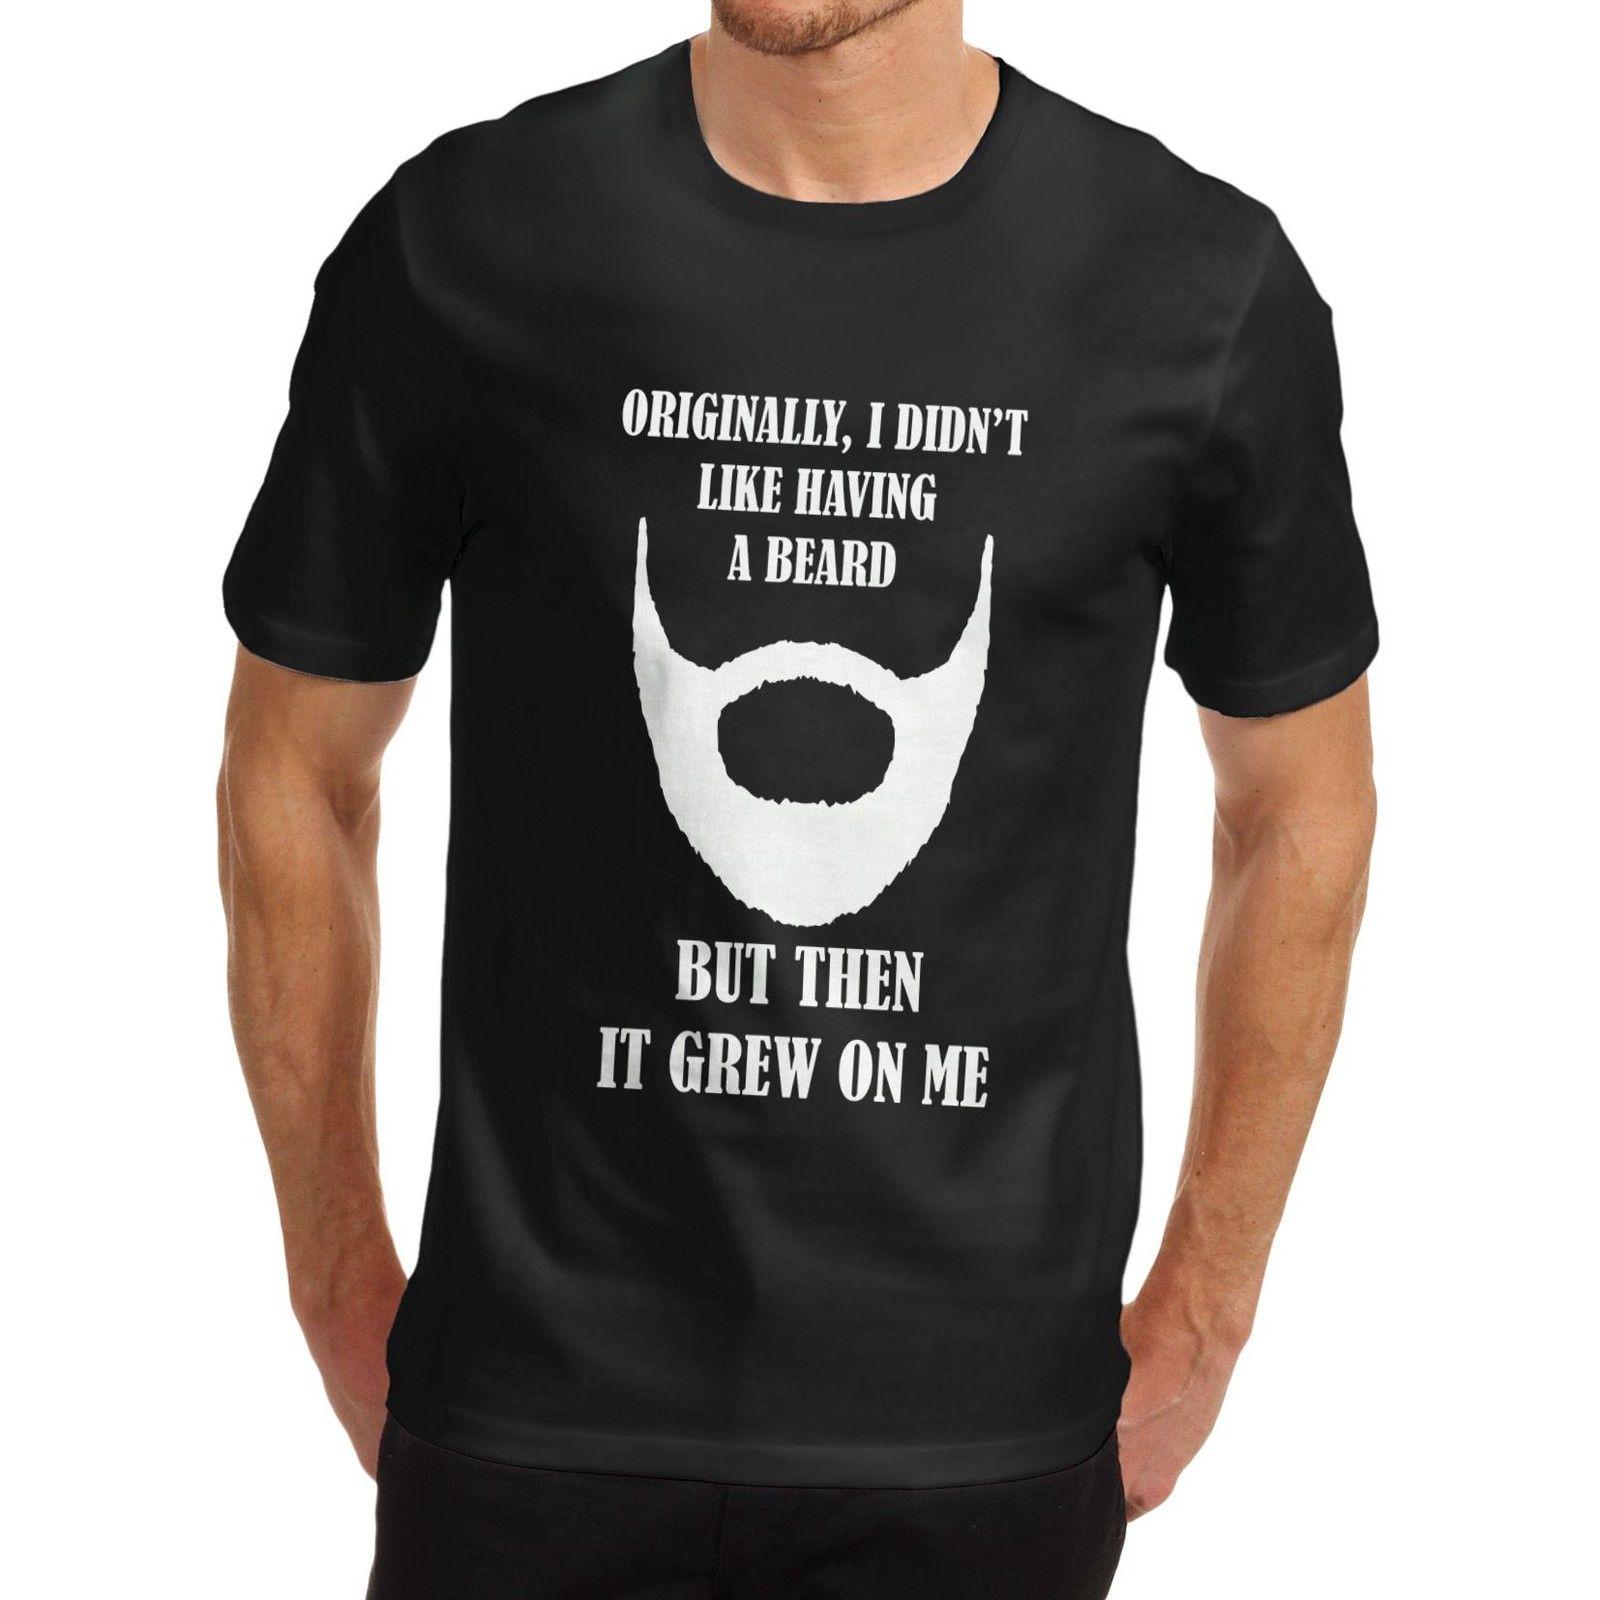 Design your own t shirt good quality - T Shirt High Quality Men Cotton Novelty Design Gift Idea Beard Grew T Shirt Loose Cotton